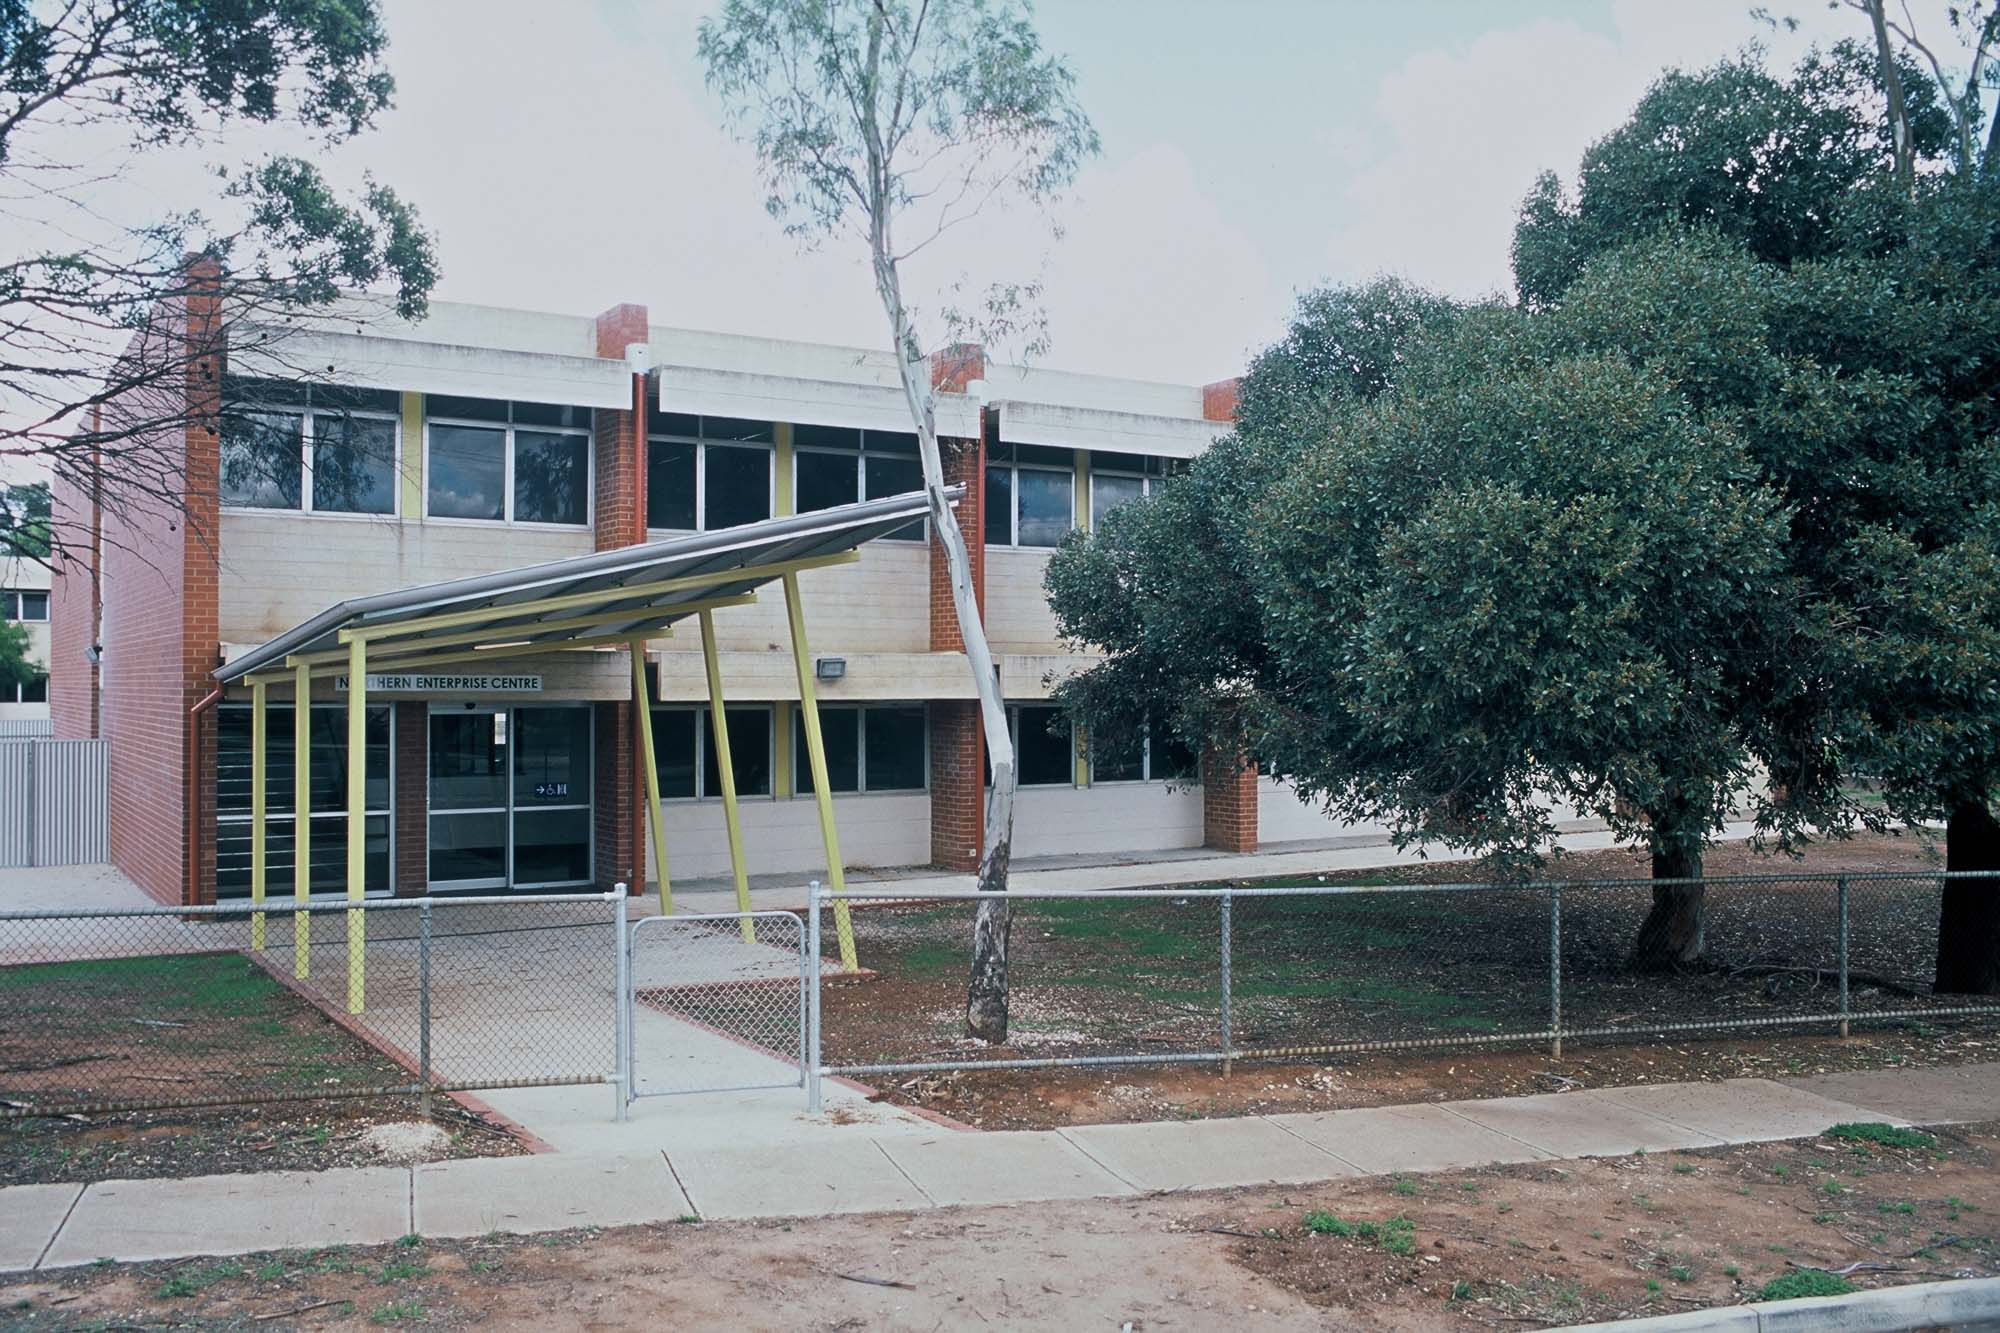 2003 - Smithfield High School Enterprise Centre